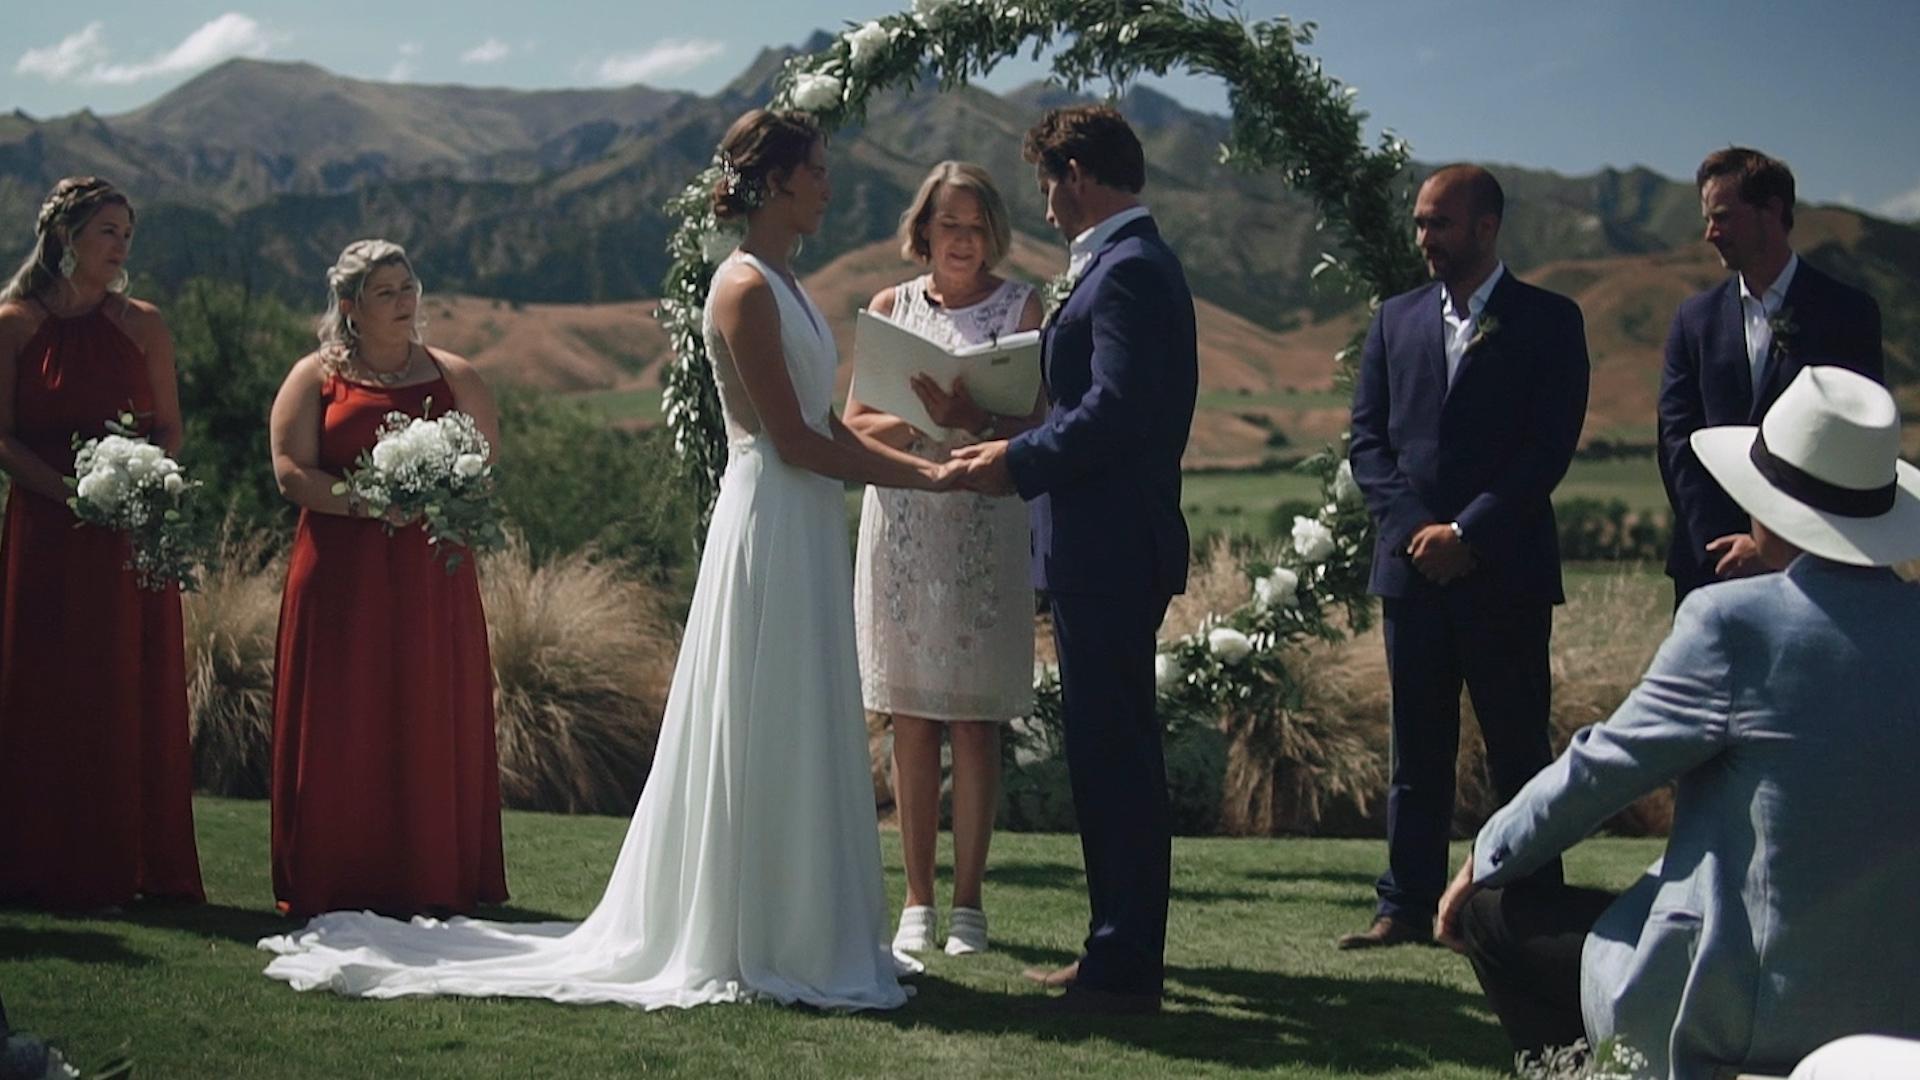 NZ Wedding Films - Ray and Tim - Wanaka 7.jpg